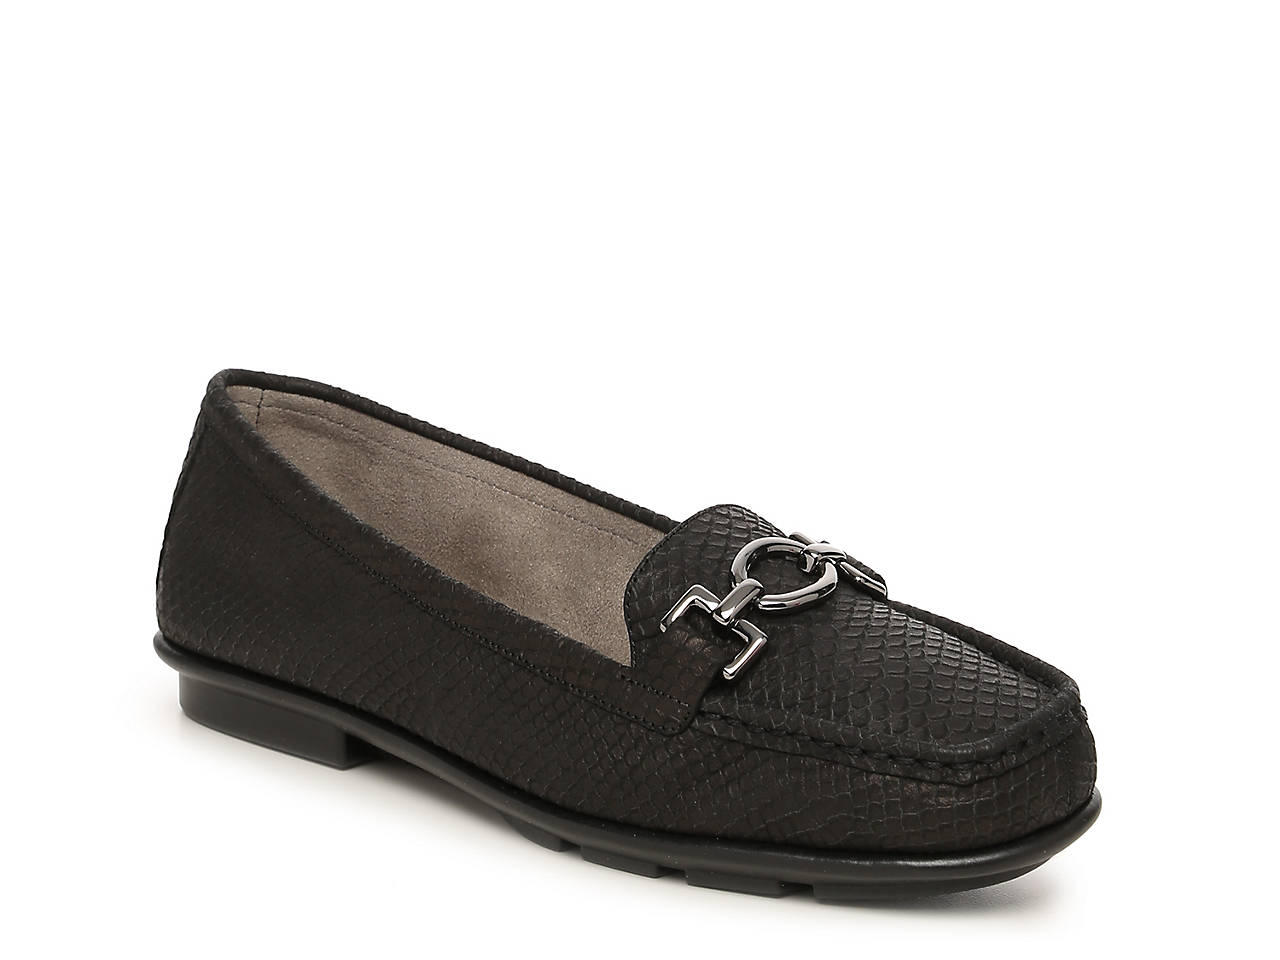 Aerosoles Hazelnut Loafer Womens Shoes